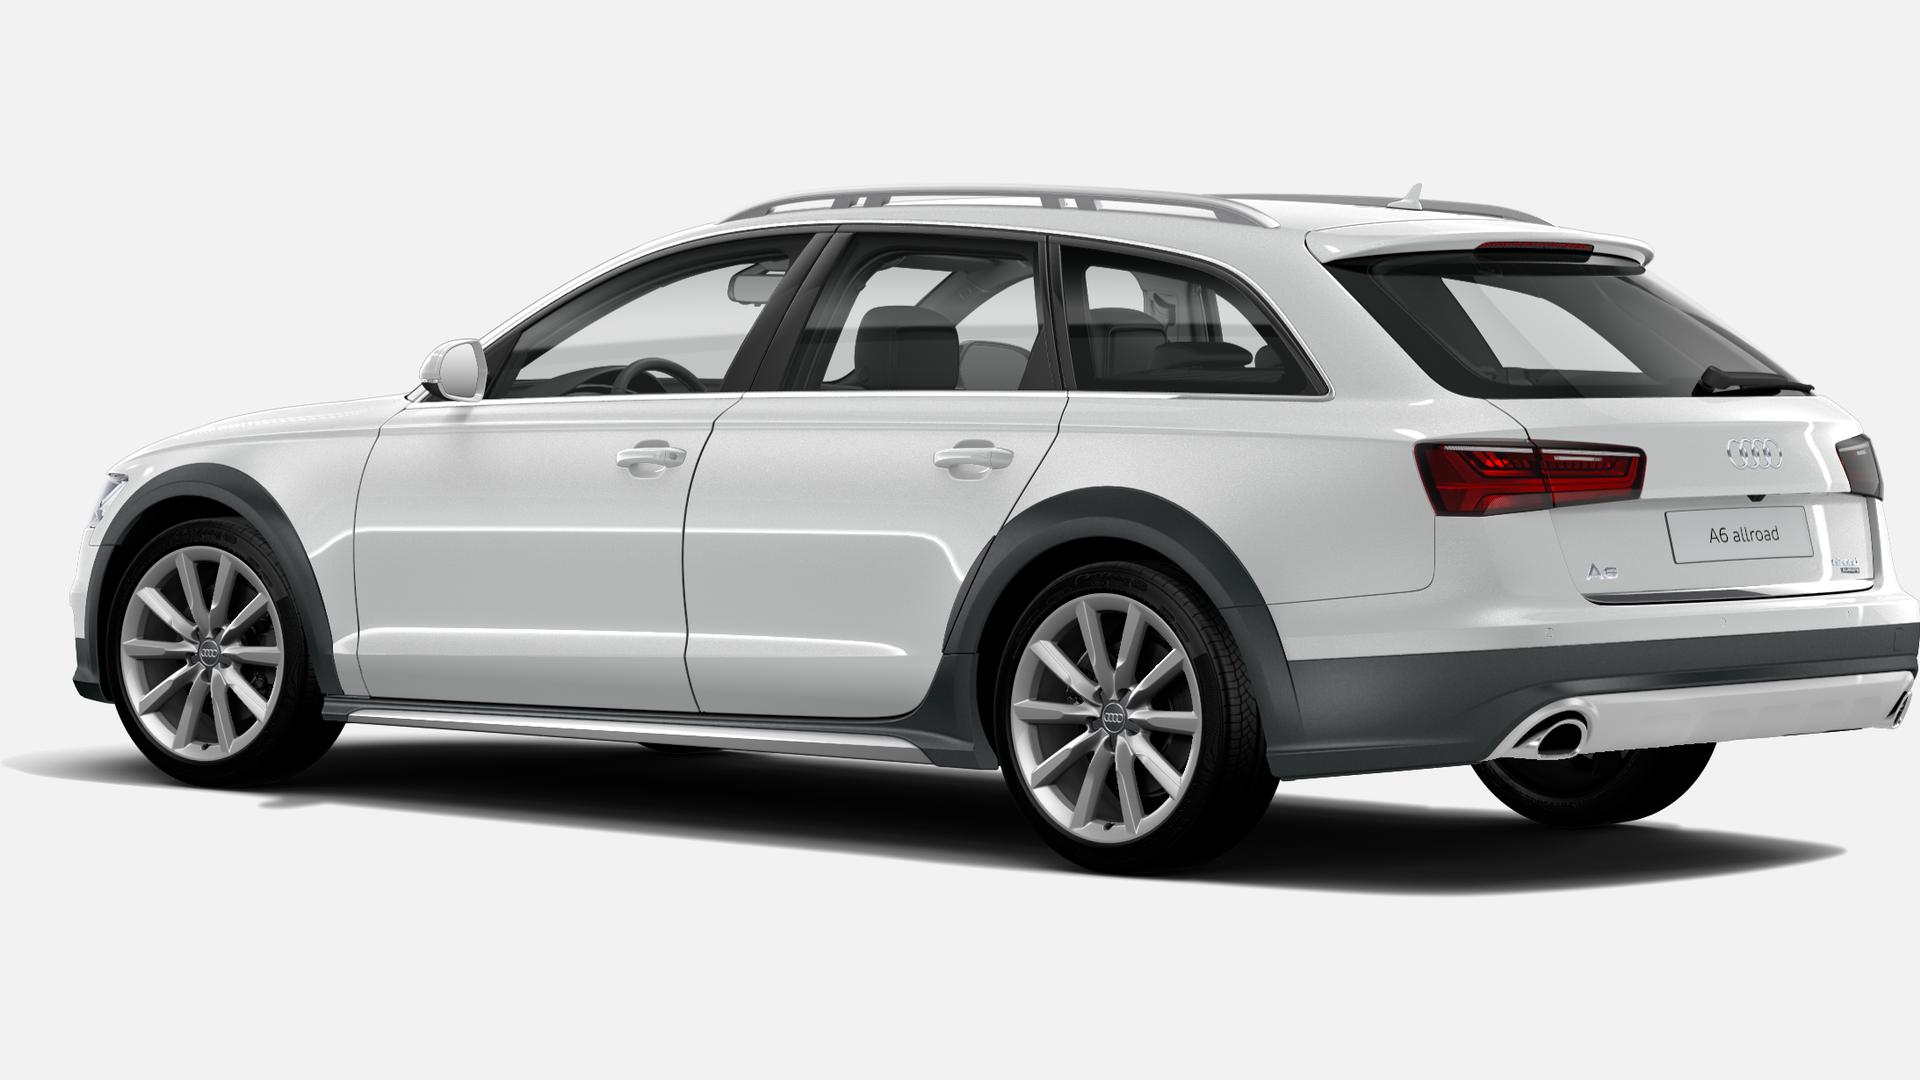 Vista Tres cuartos trasera izquierda de Audi A6 Allroad 3.0 TDI Advanced ed quattro S tron 160 kW (218 CV)